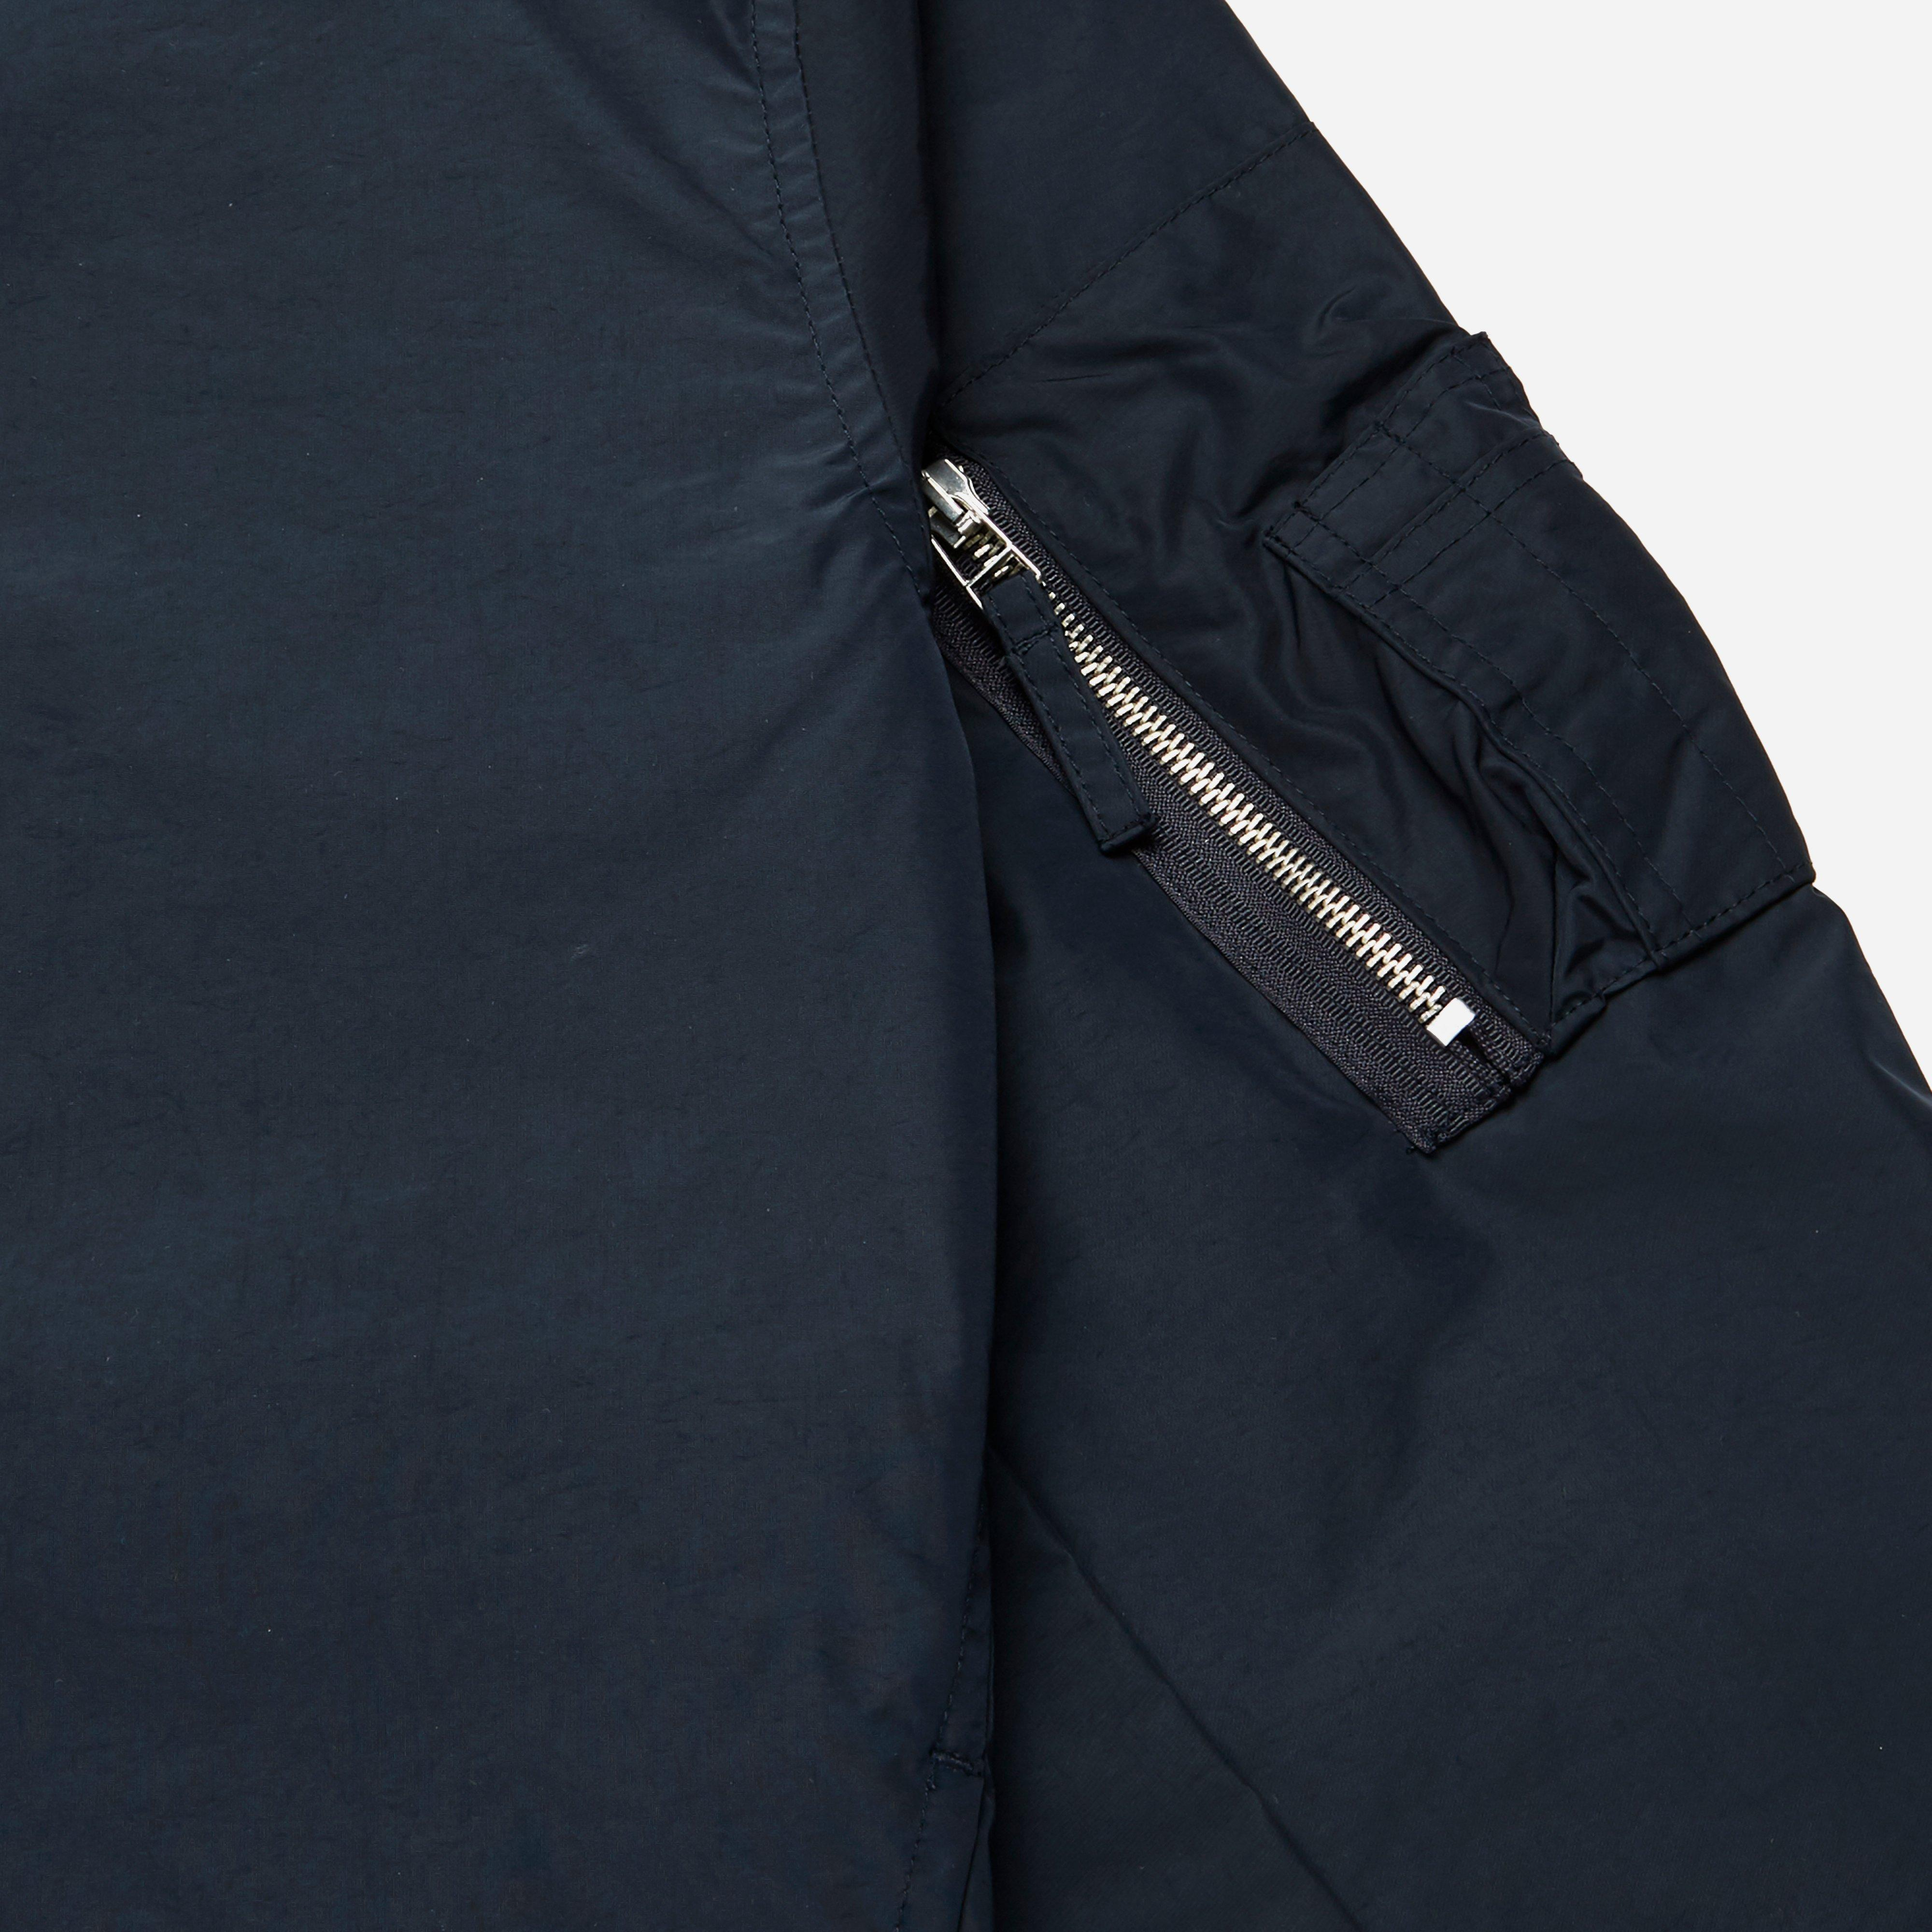 Universal Works Synthetic Idra Nylon Uw/ma1 Jacket in Navy (Blue) for Men